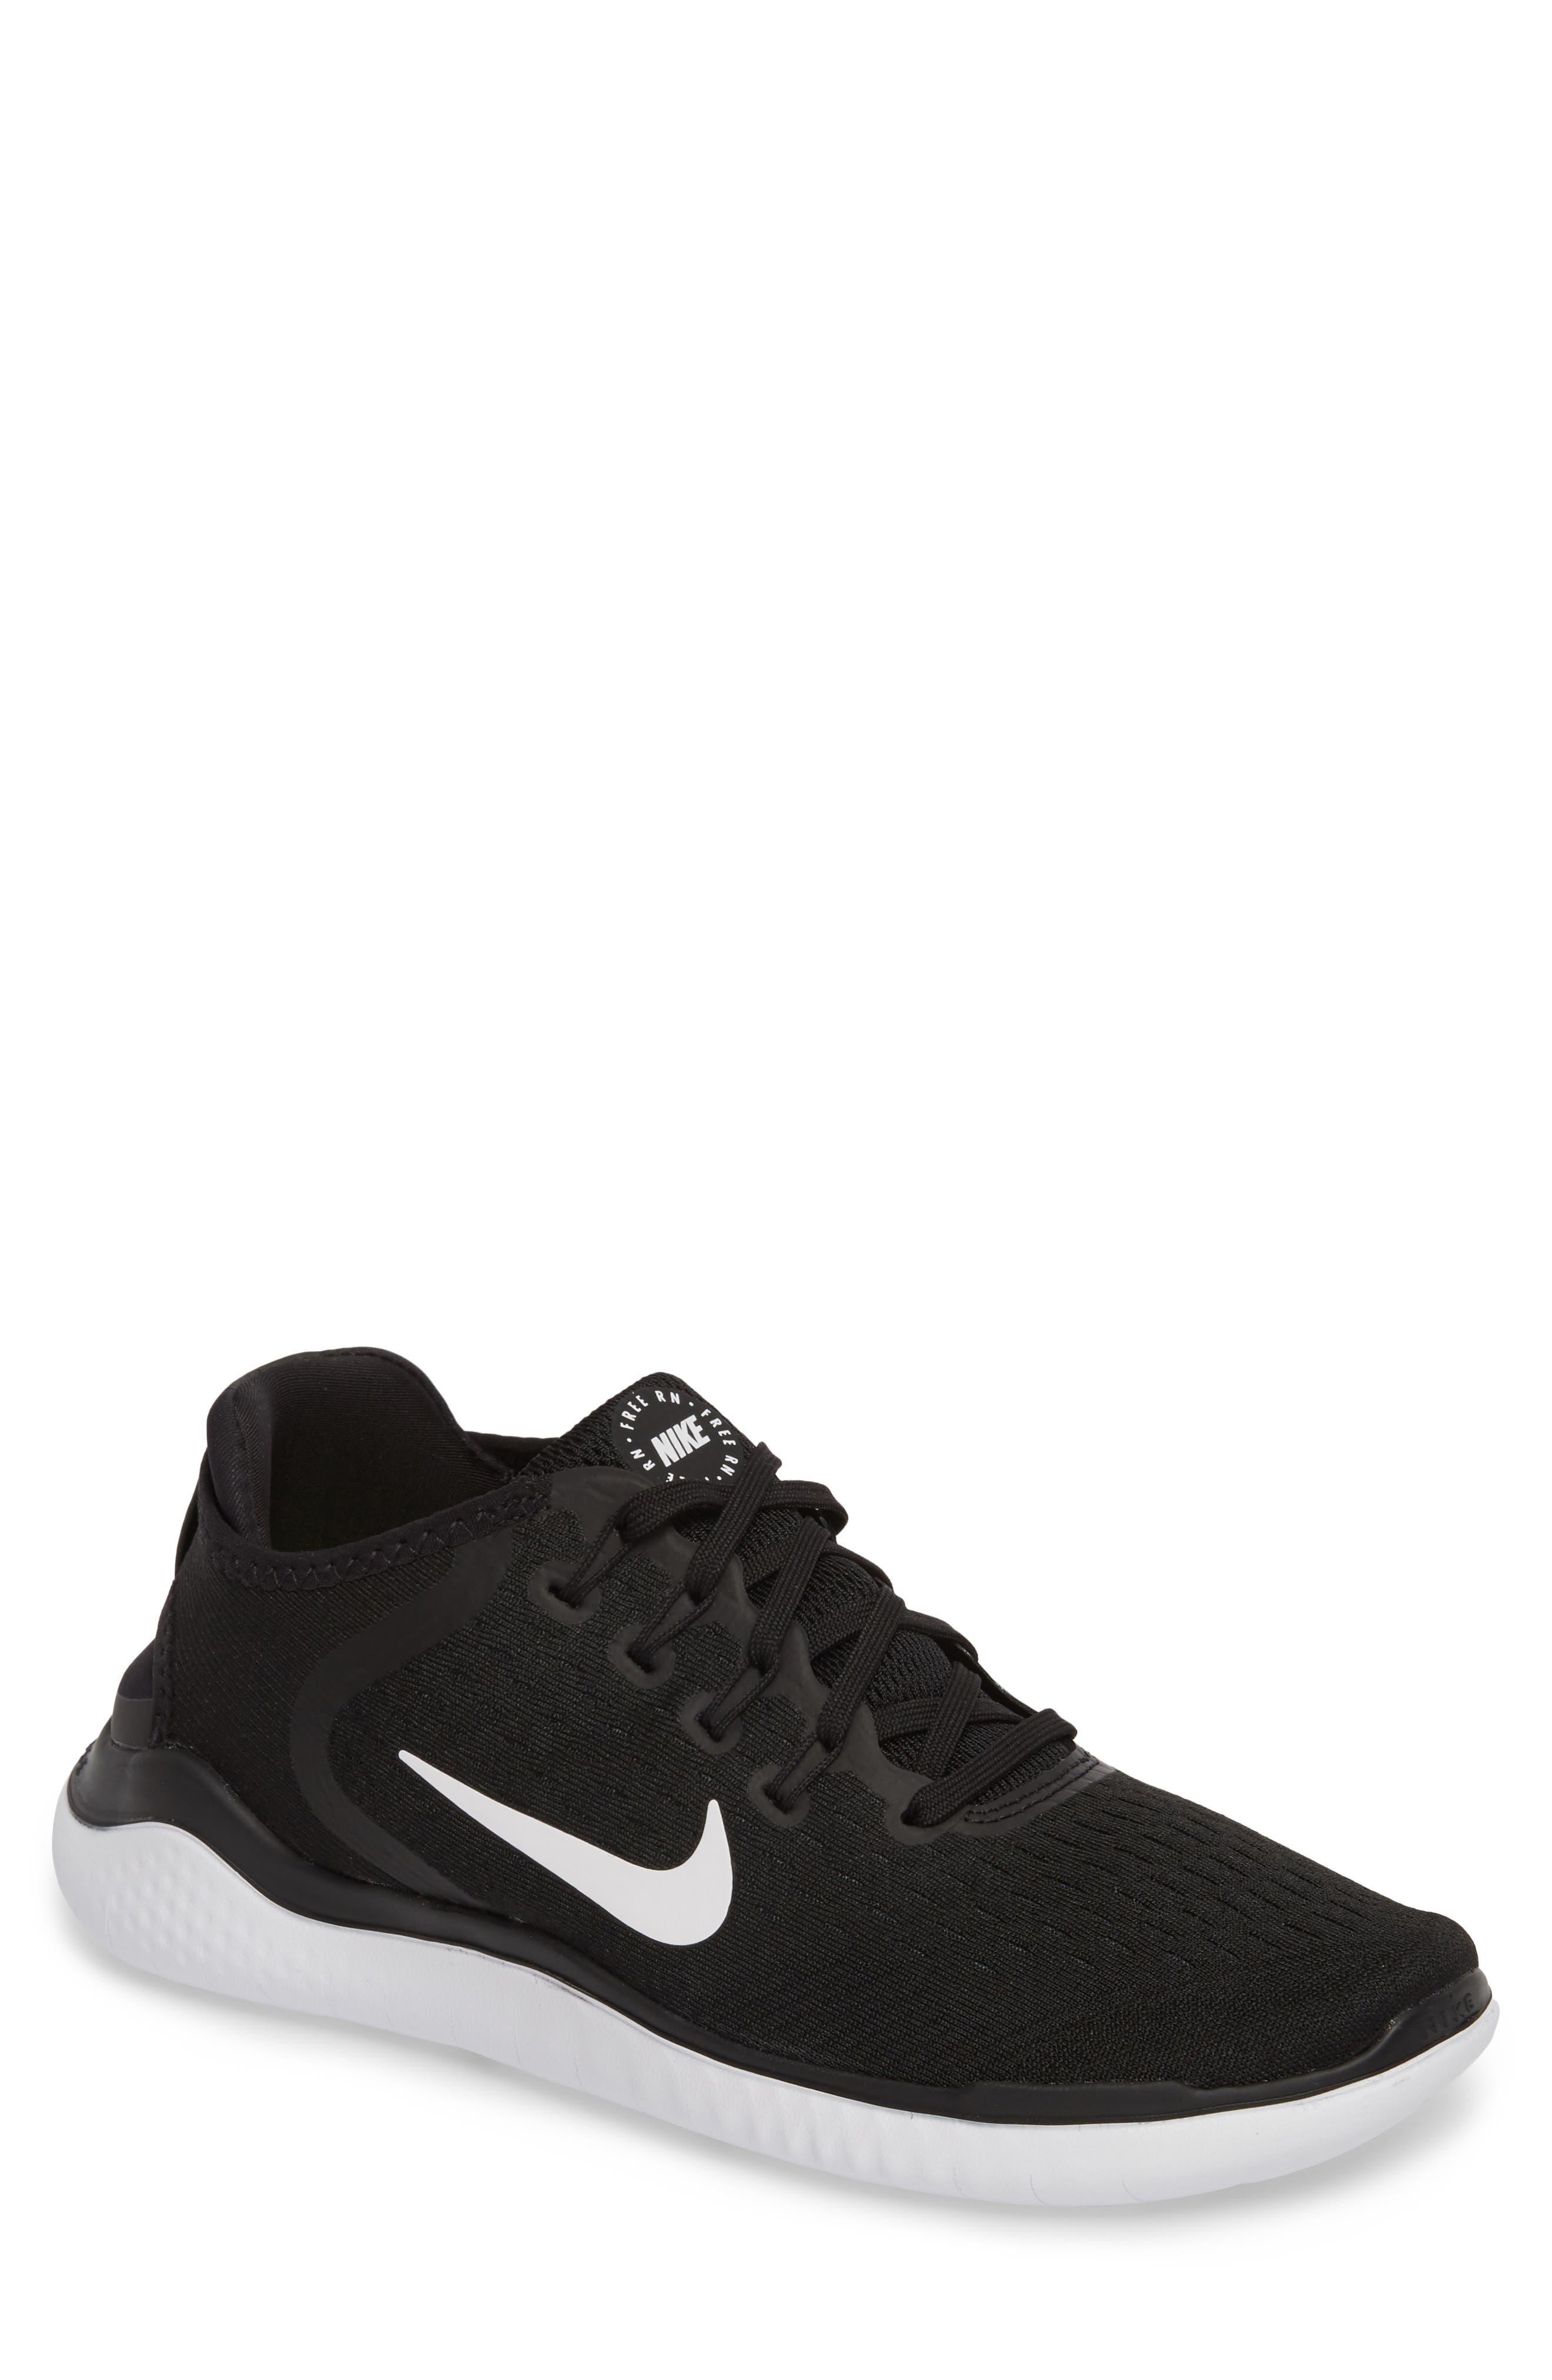 Free RN 2018 Running Shoe,                         Main,                         color, BLACK/ WHITE